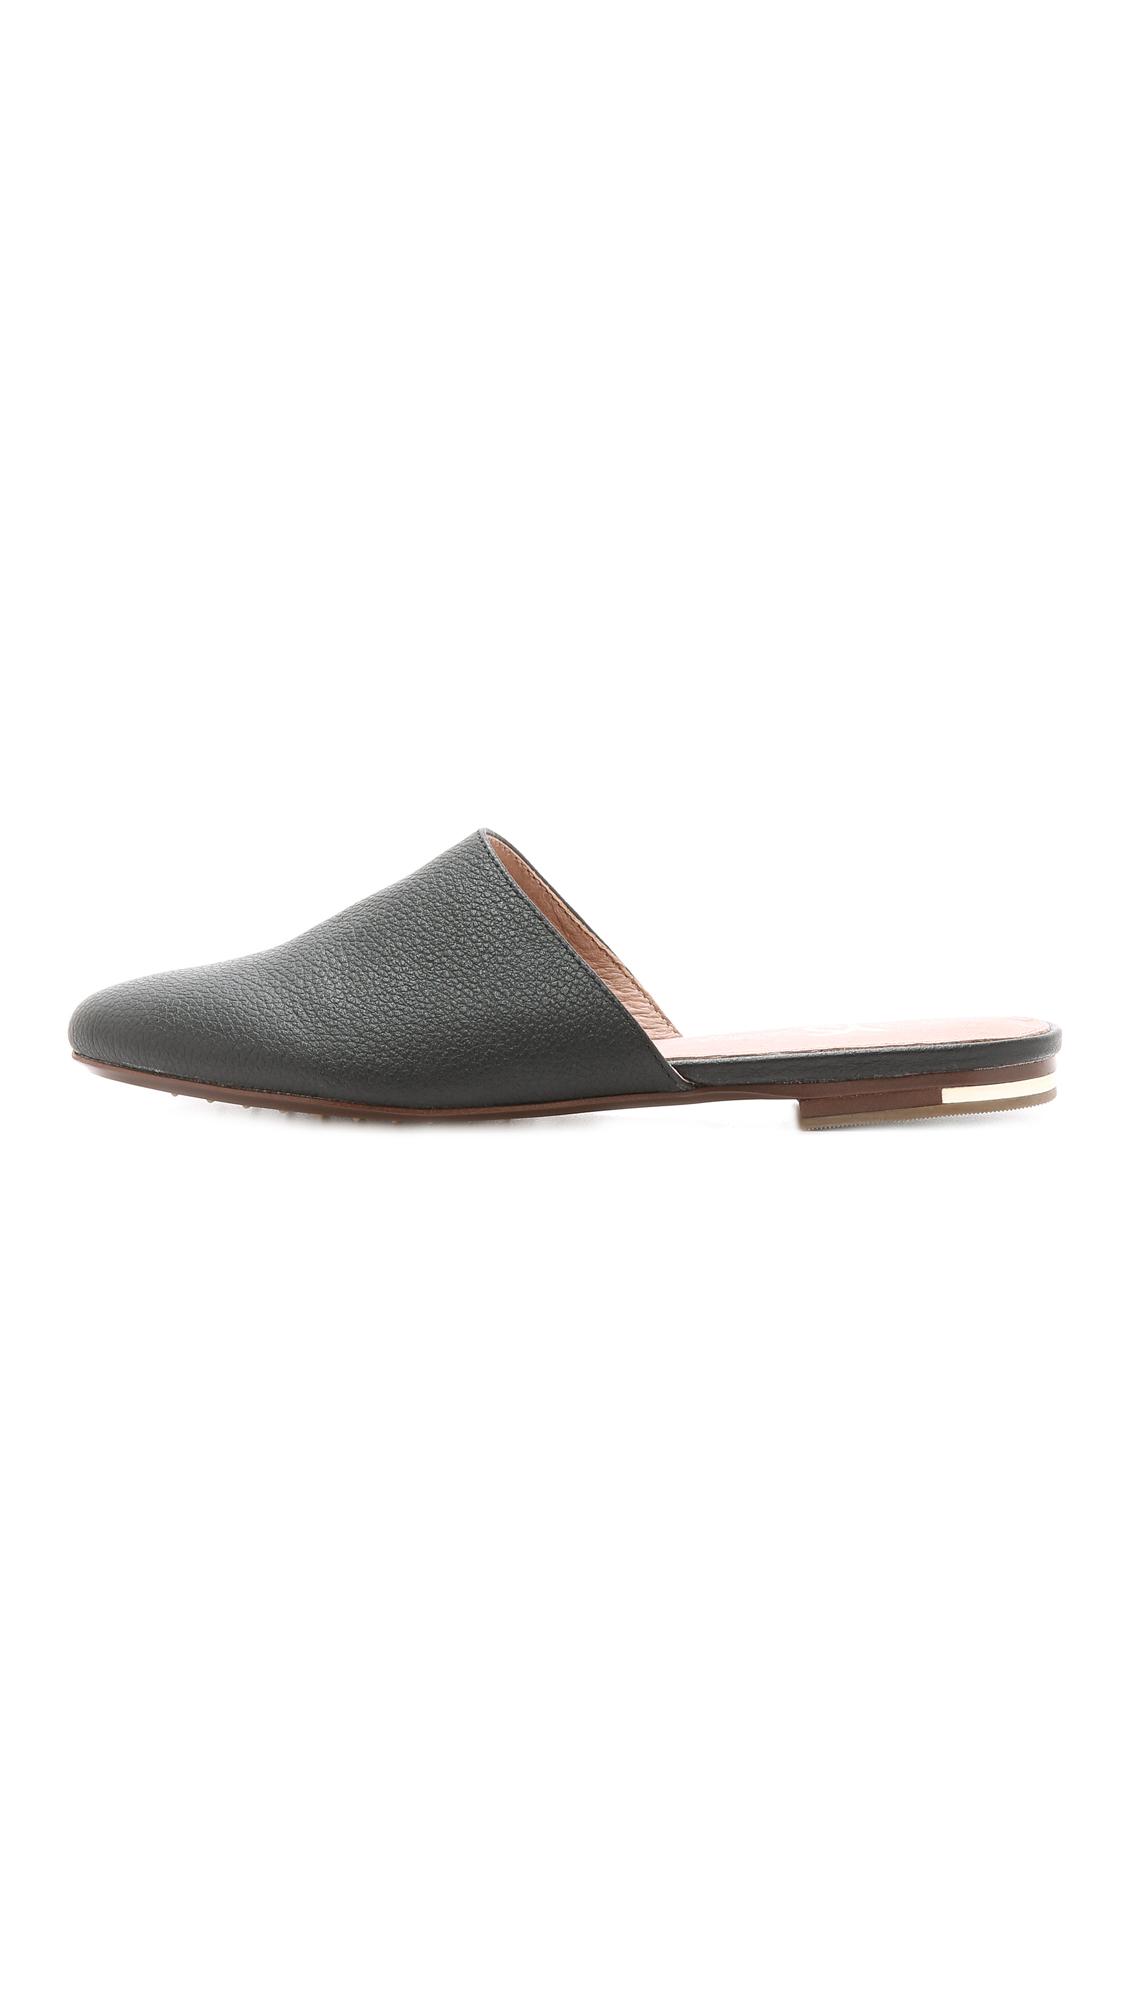 Yosi samra Parker Flat Mules - Black in Black | Lyst